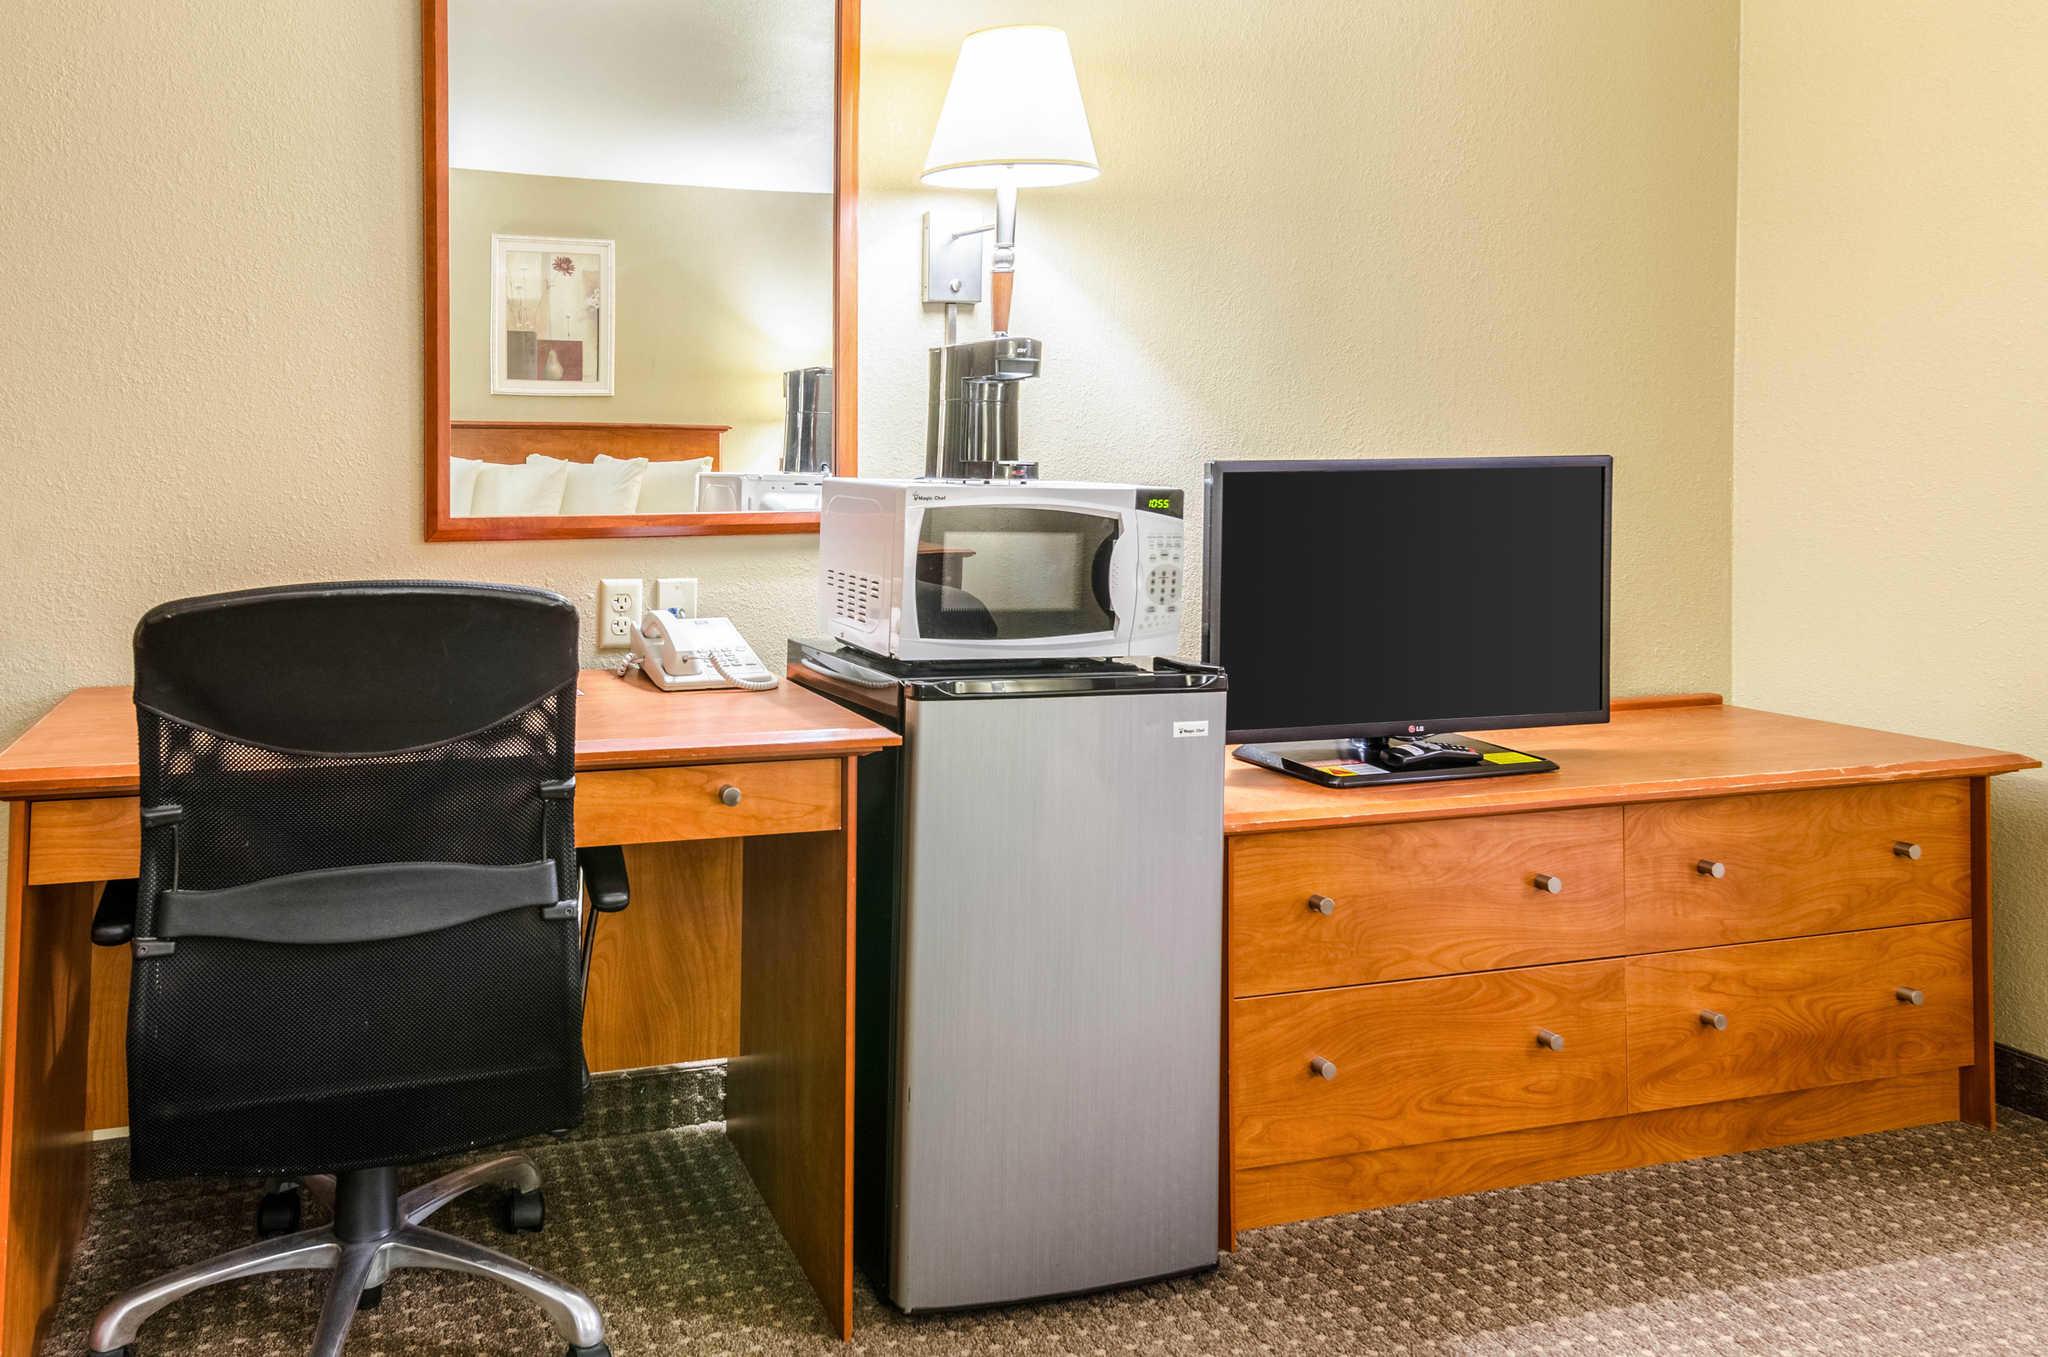 Econo Lodge  Inn & Suites I-35 at Shawnee Mission image 24